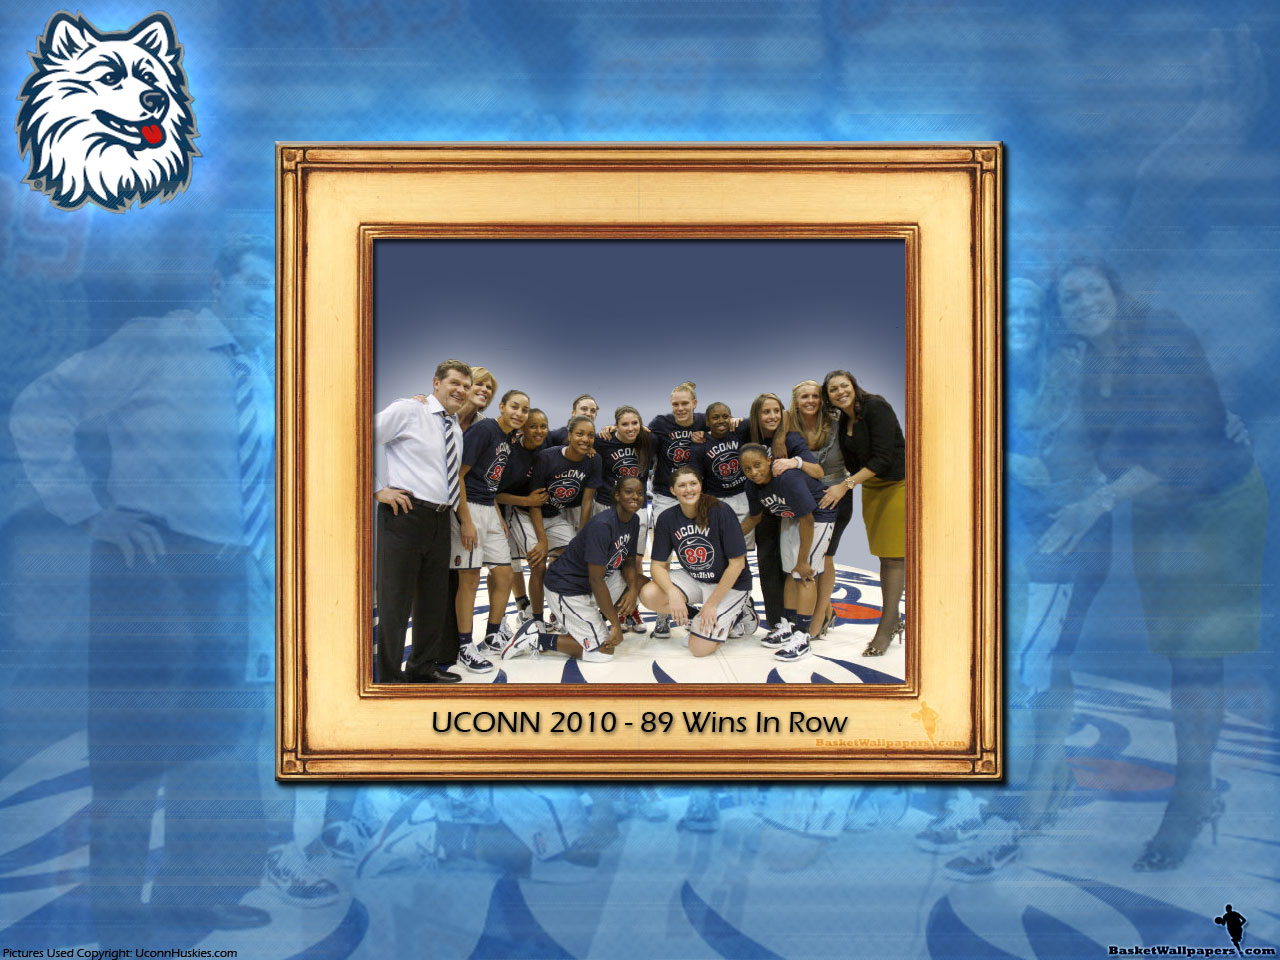 http://3.bp.blogspot.com/-pSKgRRfsUuk/TmShLLTDURI/AAAAAAAAD-U/P27kw01HFsc/s1600/UCONN-Women-89-Wins-In-Row-Wallpaper.jpg